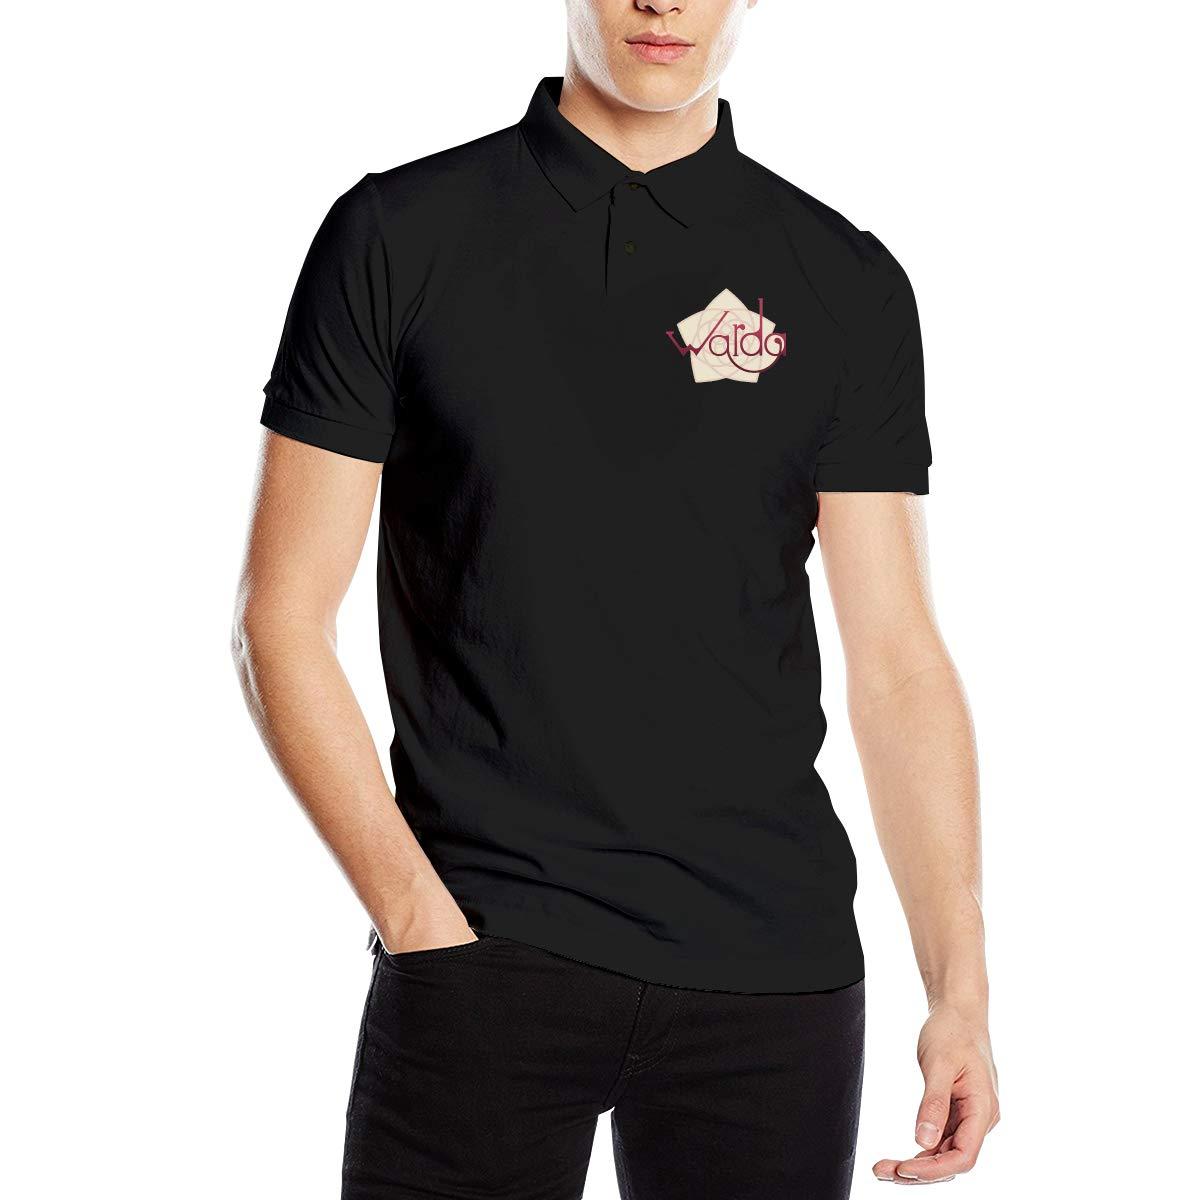 Cjlrqone Warda Mens Personality Polo Shirts Black